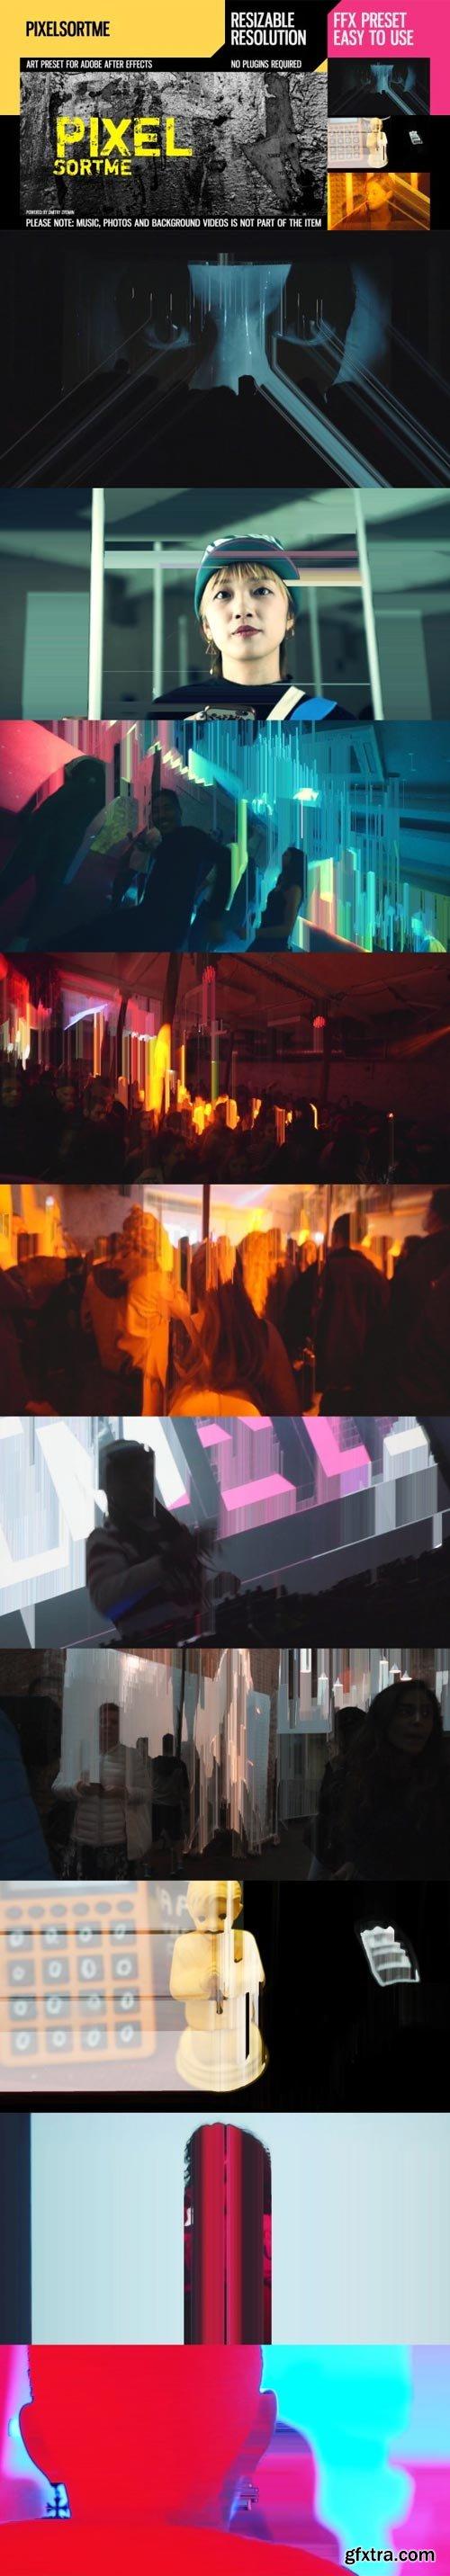 Videohive - PixelSortMe - 24717711